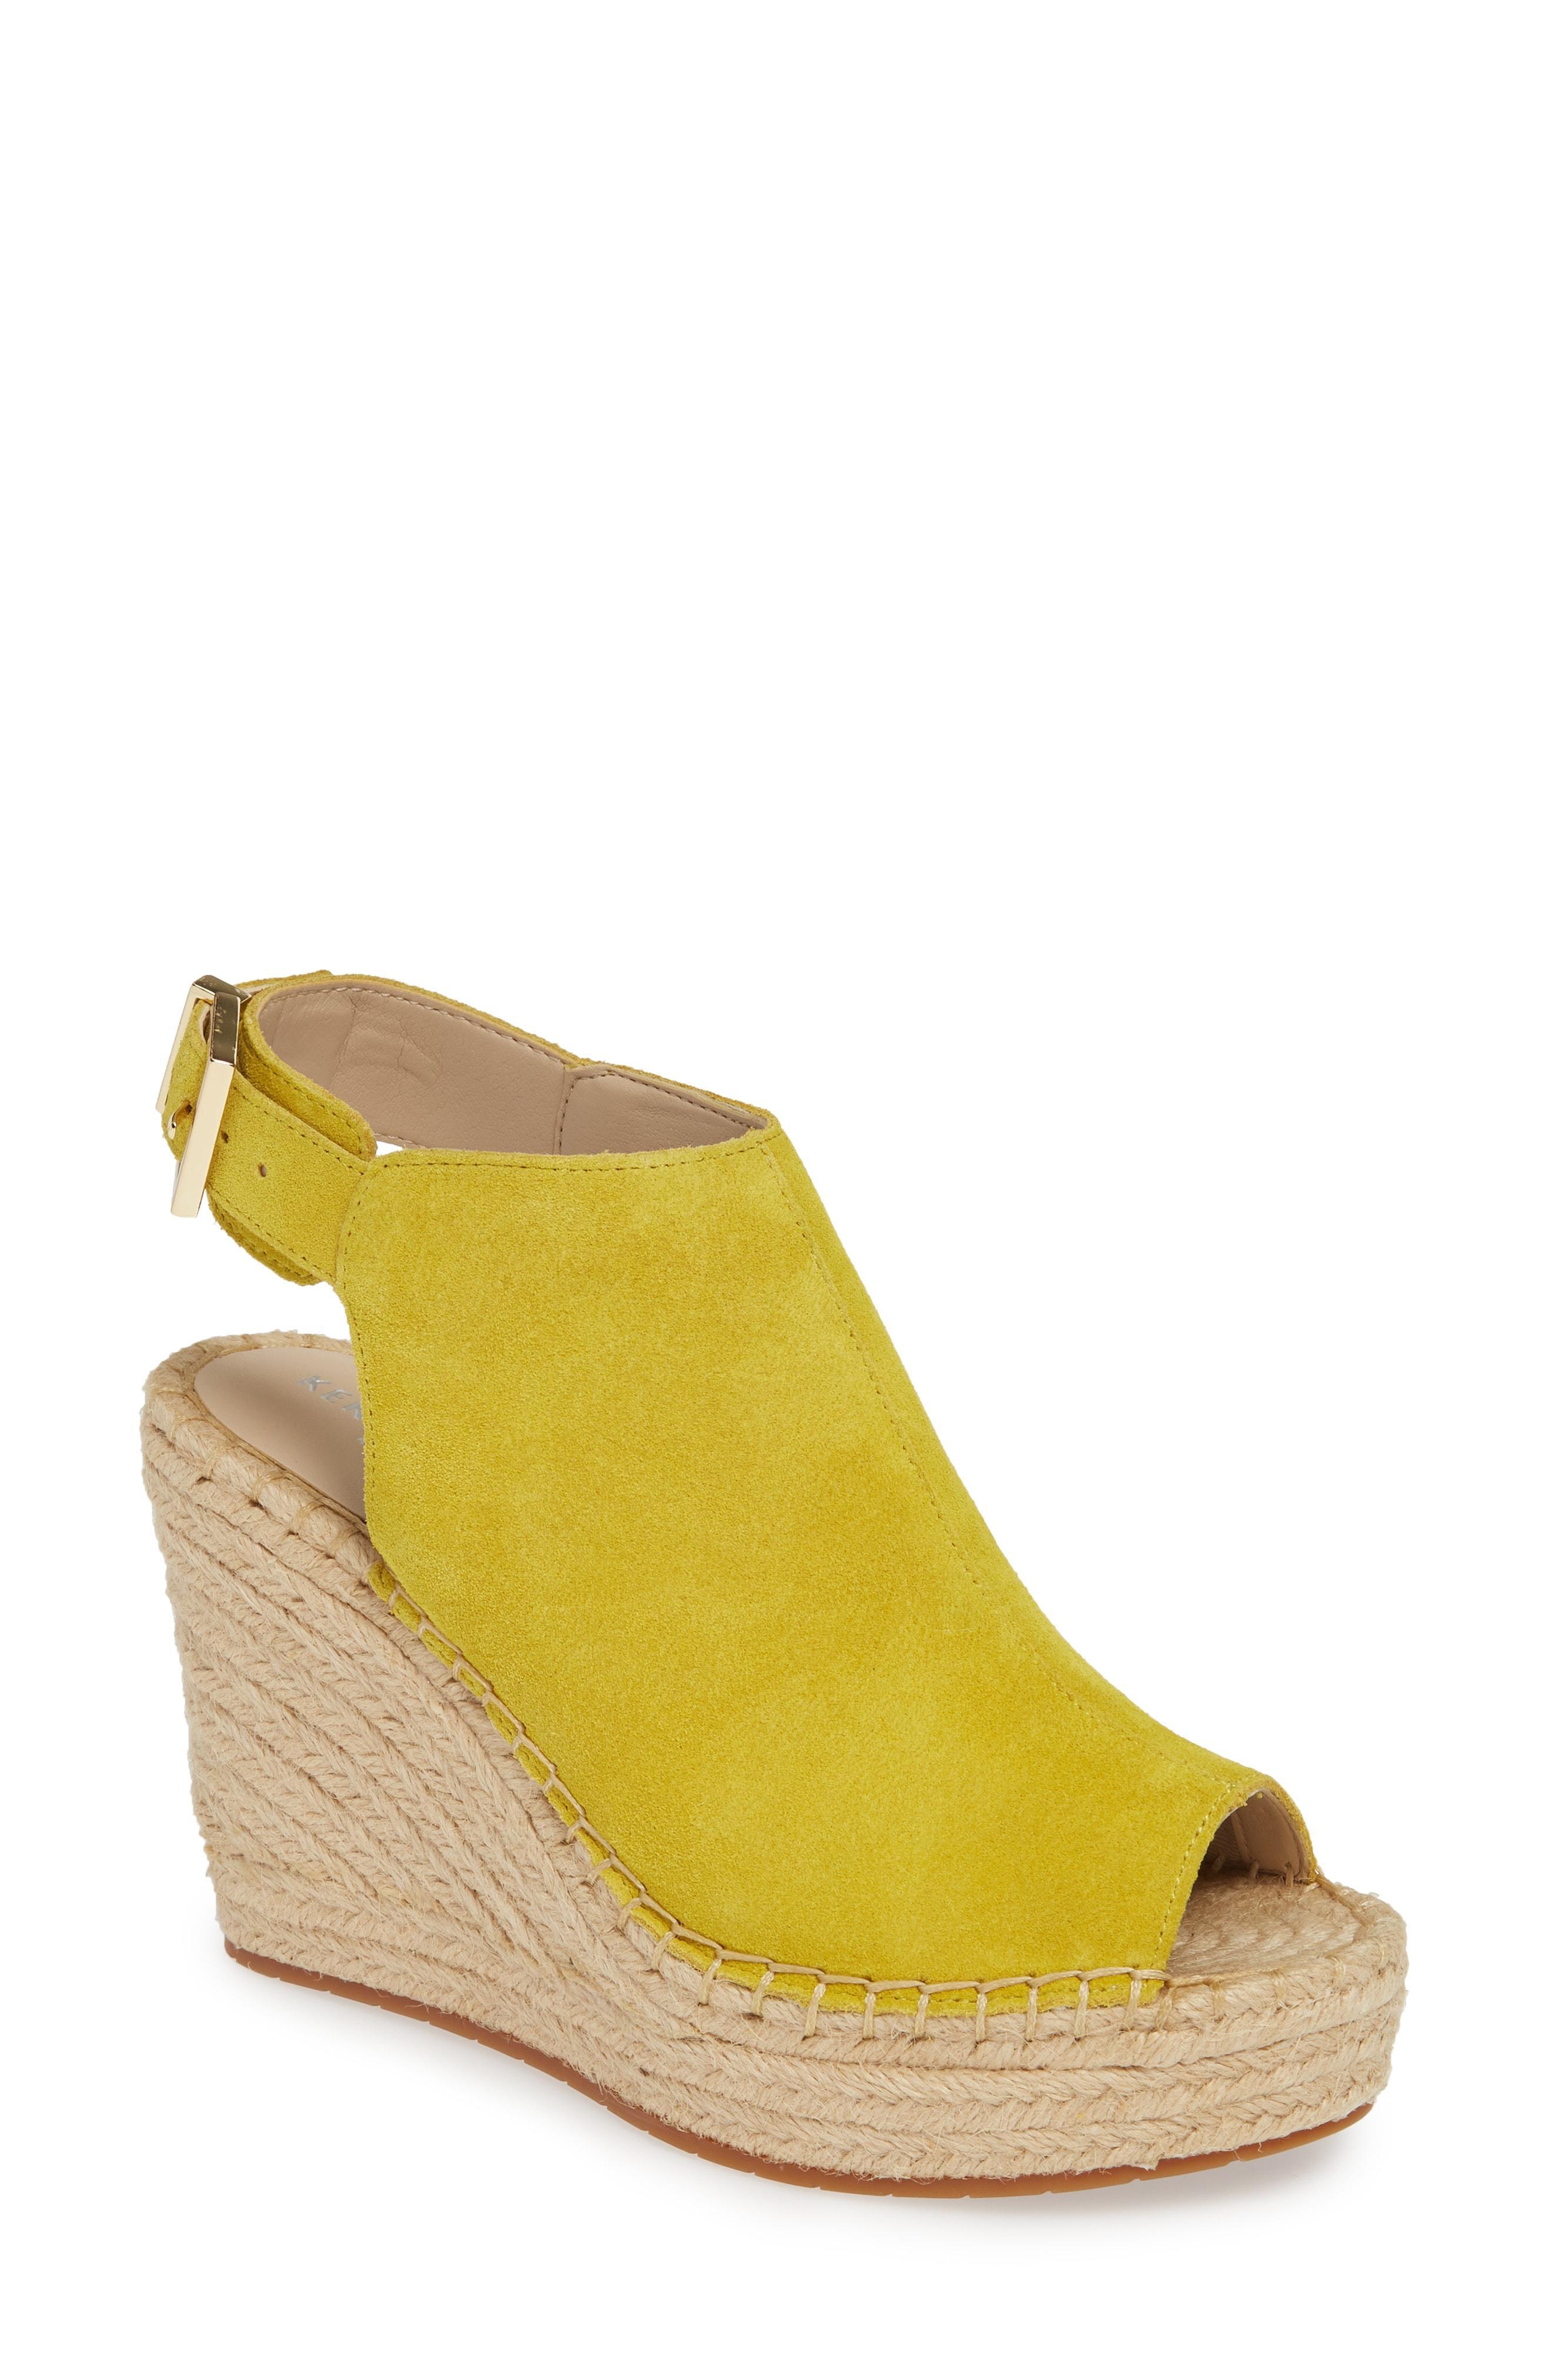 613b7854fcc4 Lyst - Kenneth Cole  olivia  Espadrille Wedge Sandal in Yellow